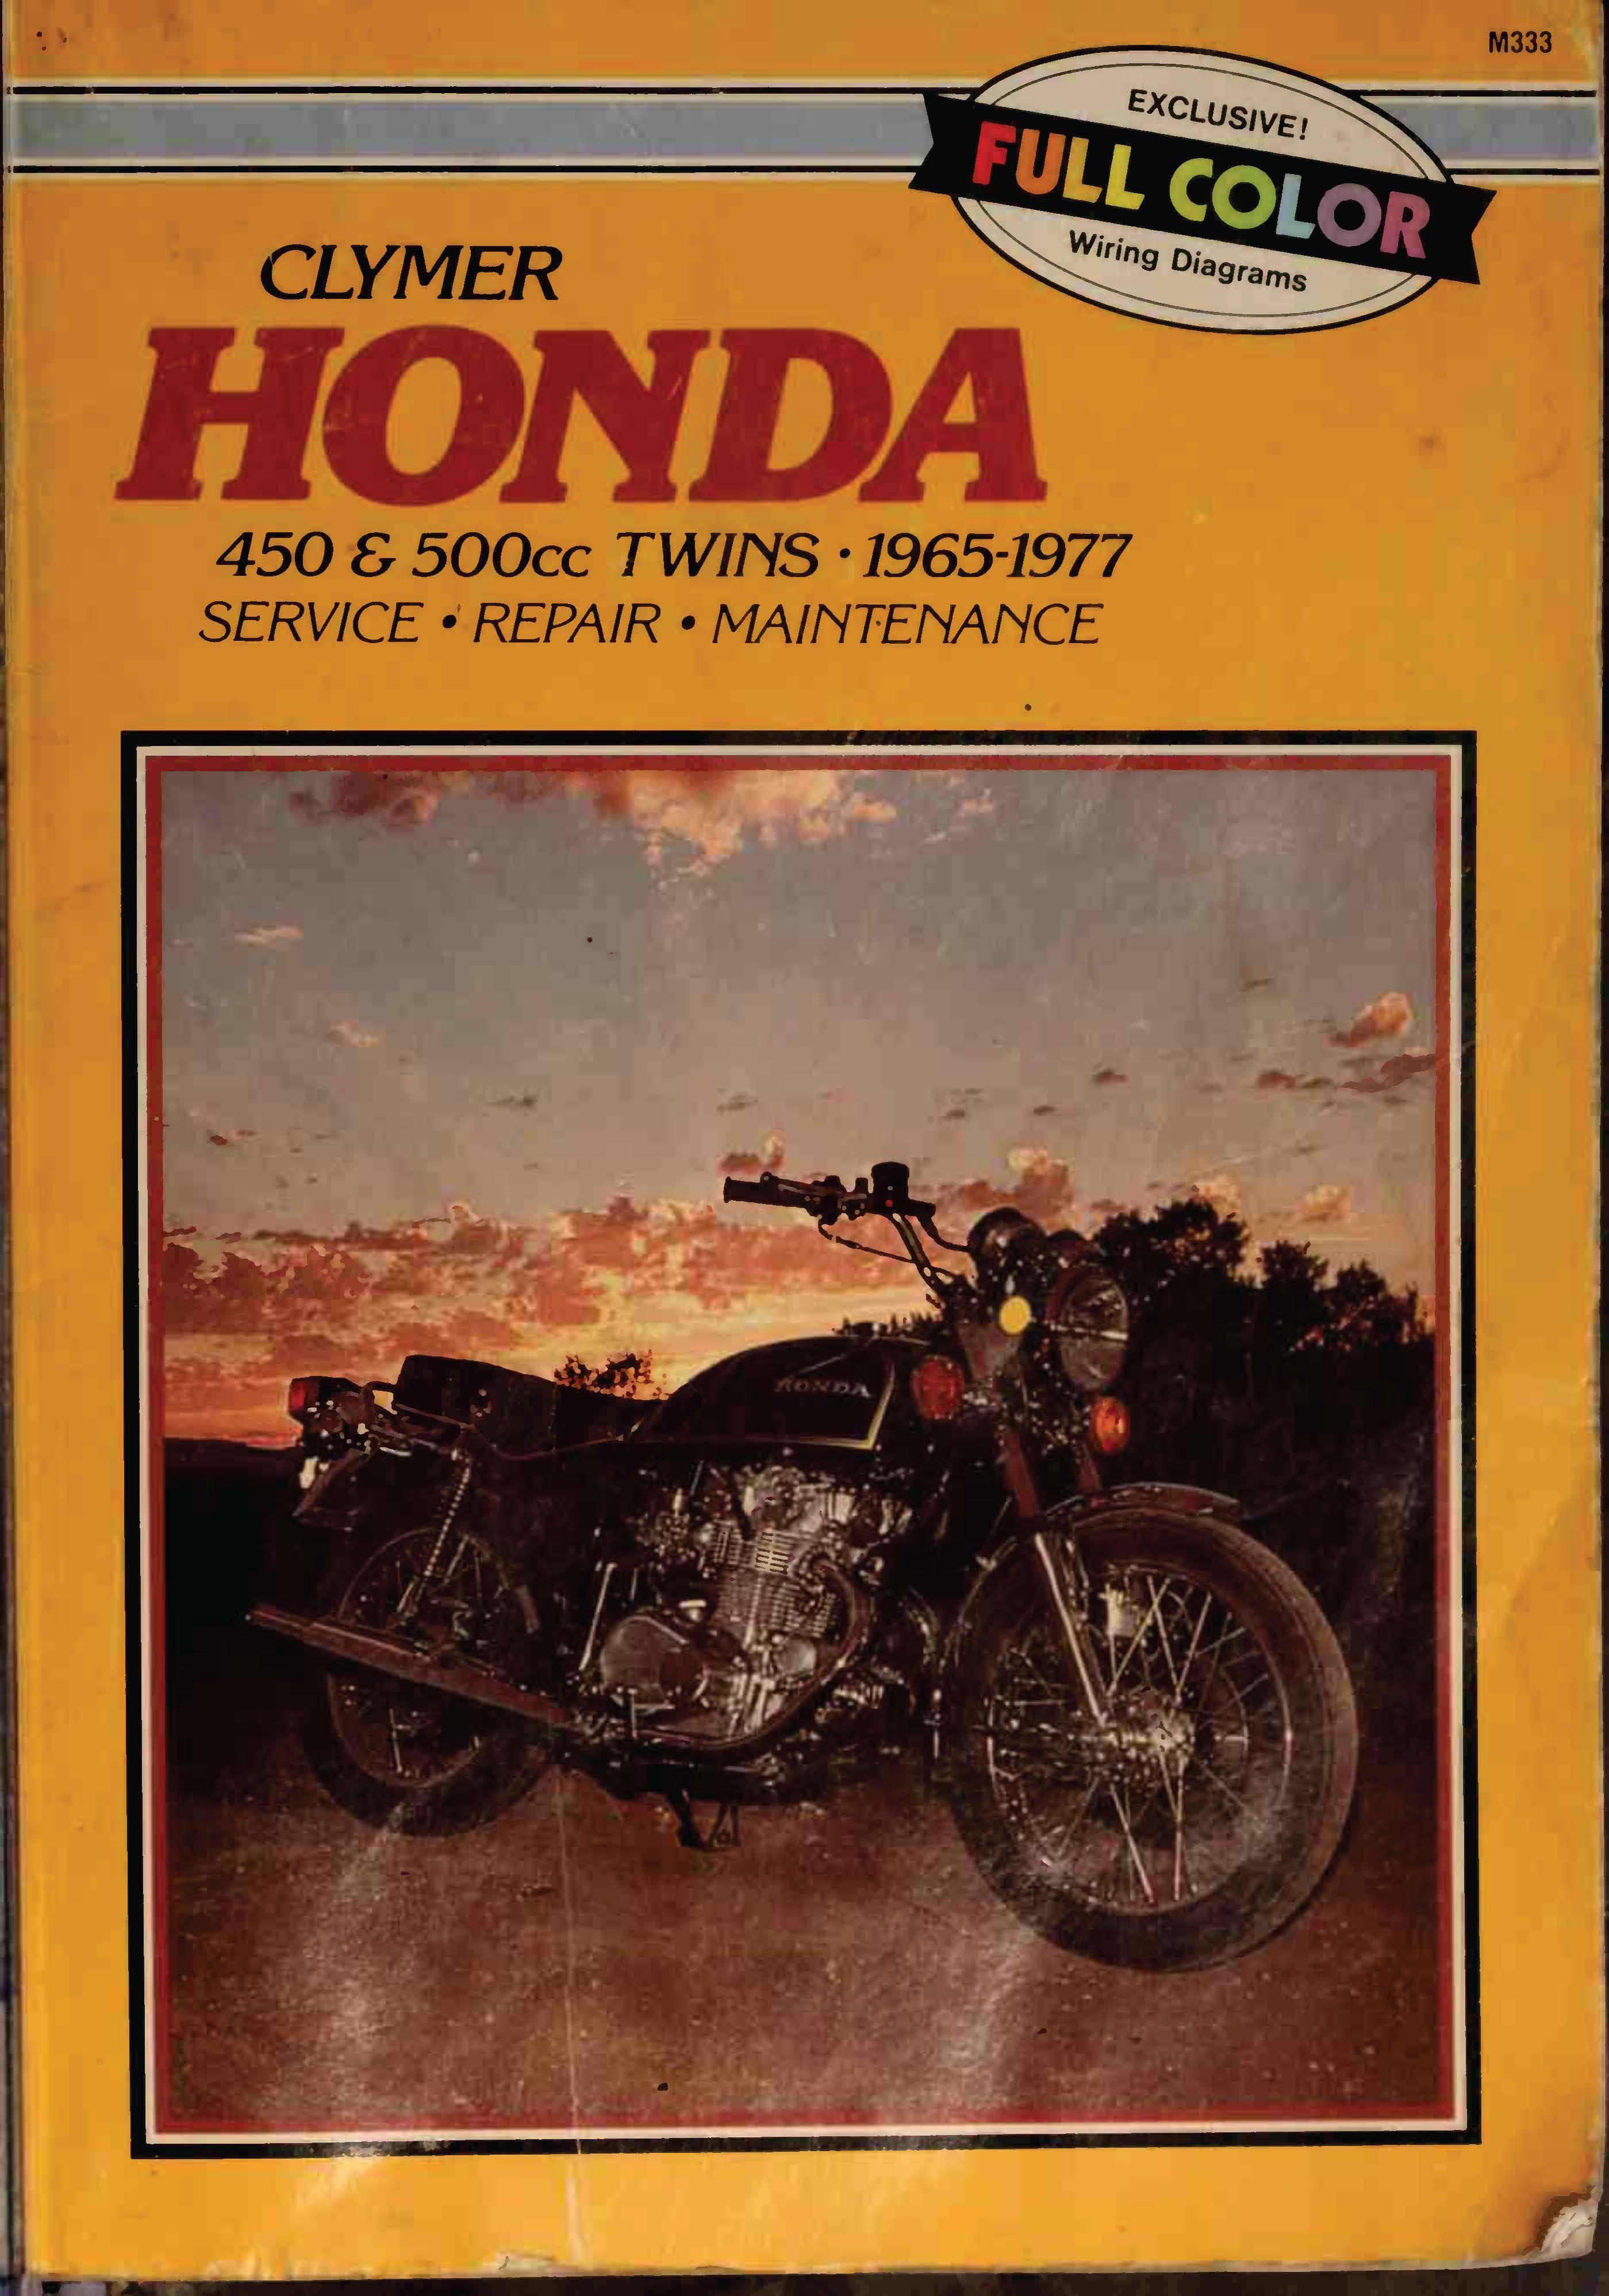 Clymer Honda 450 & 500cc twins - 1965-1977